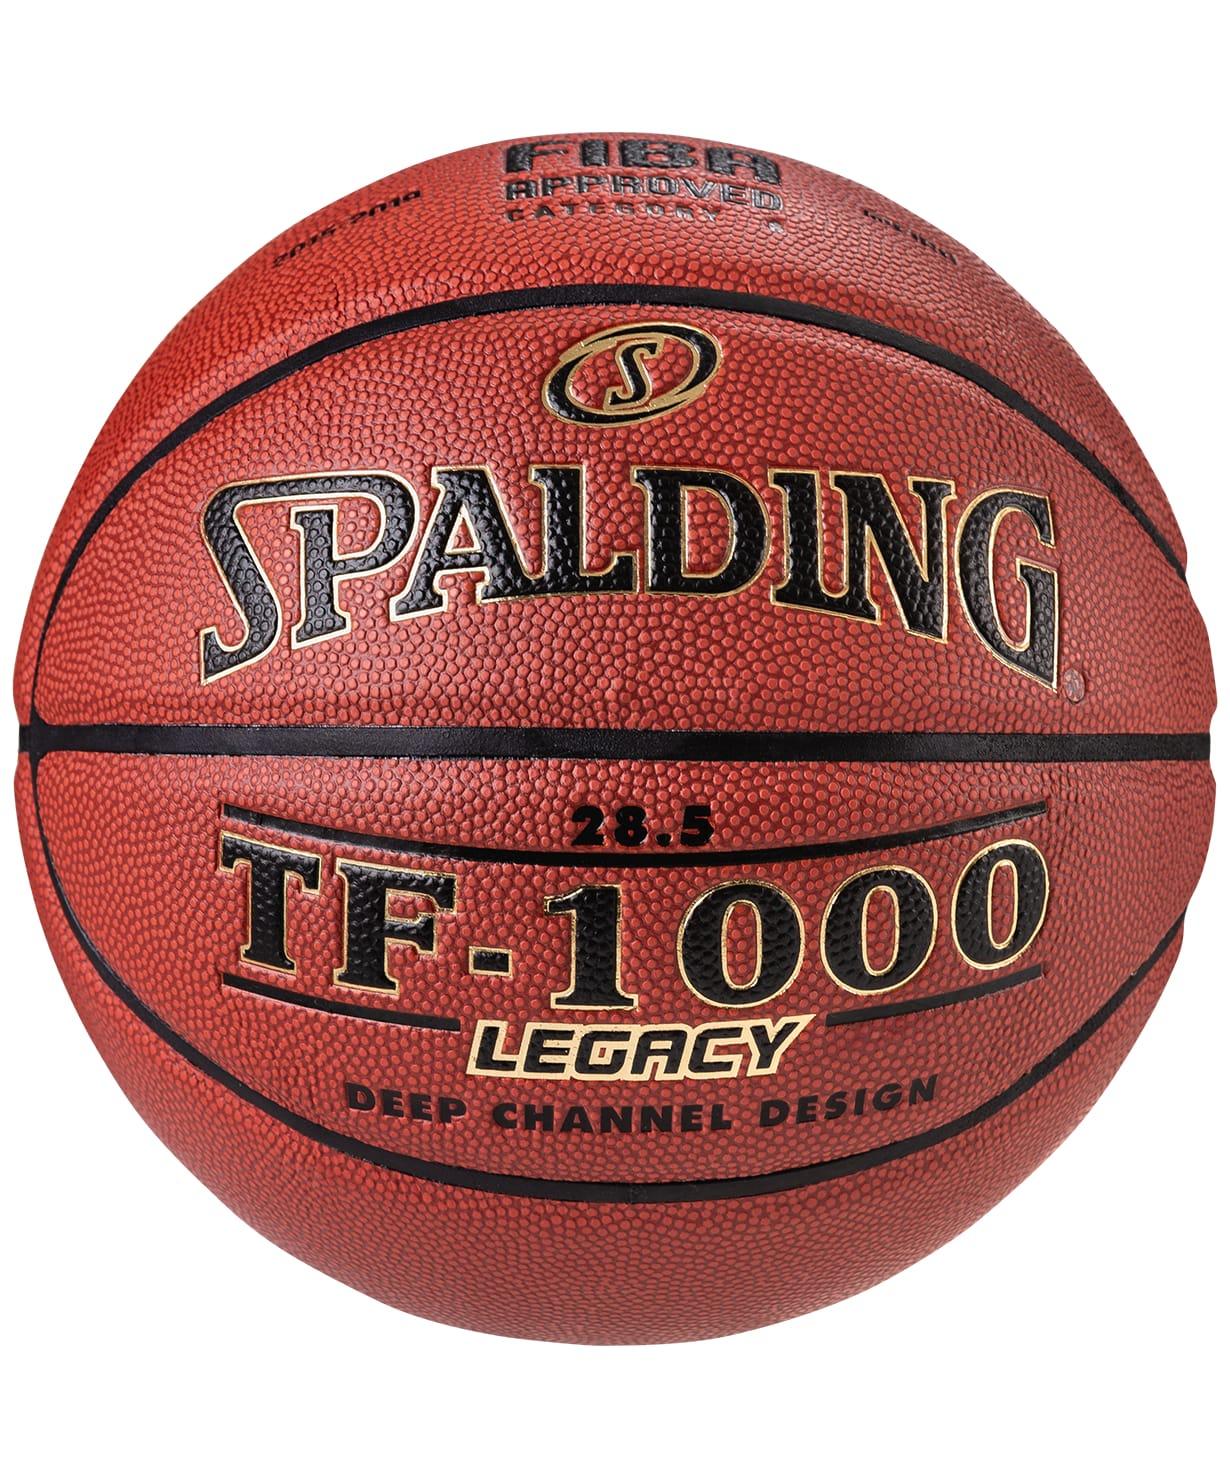 все цены на Мяч баскетбольный Spalding TF-1000 Legacy №6 (74-451Z) онлайн